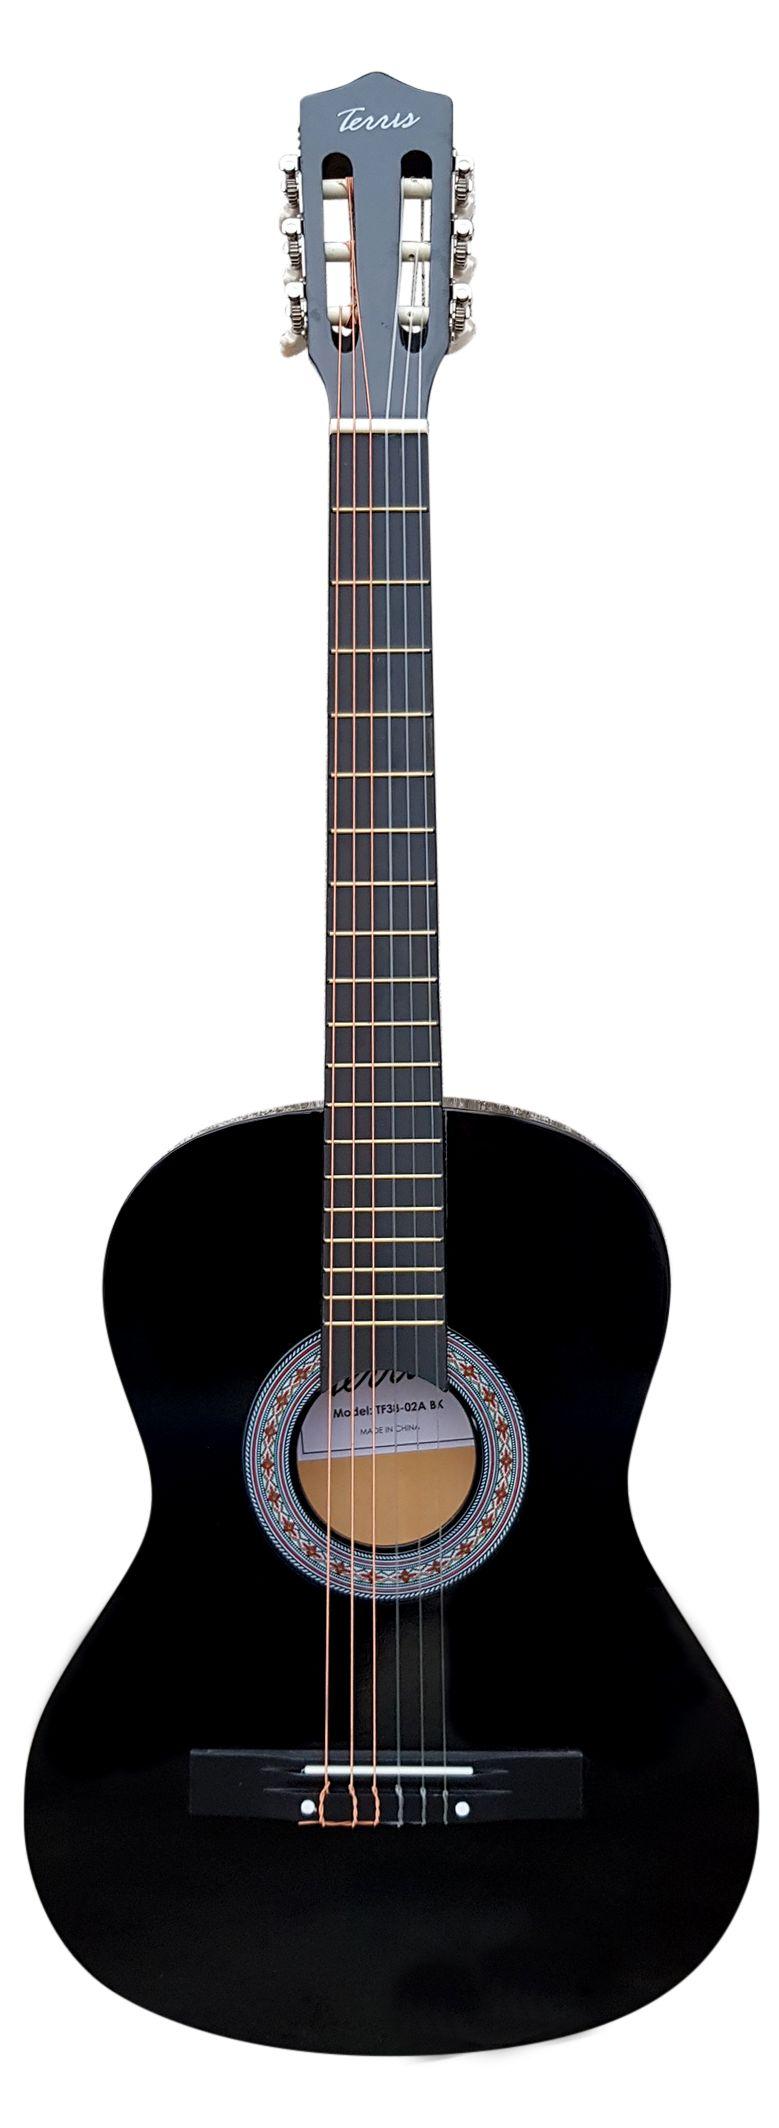 Акустическая гитара TERRIS TF-3802A BK фото